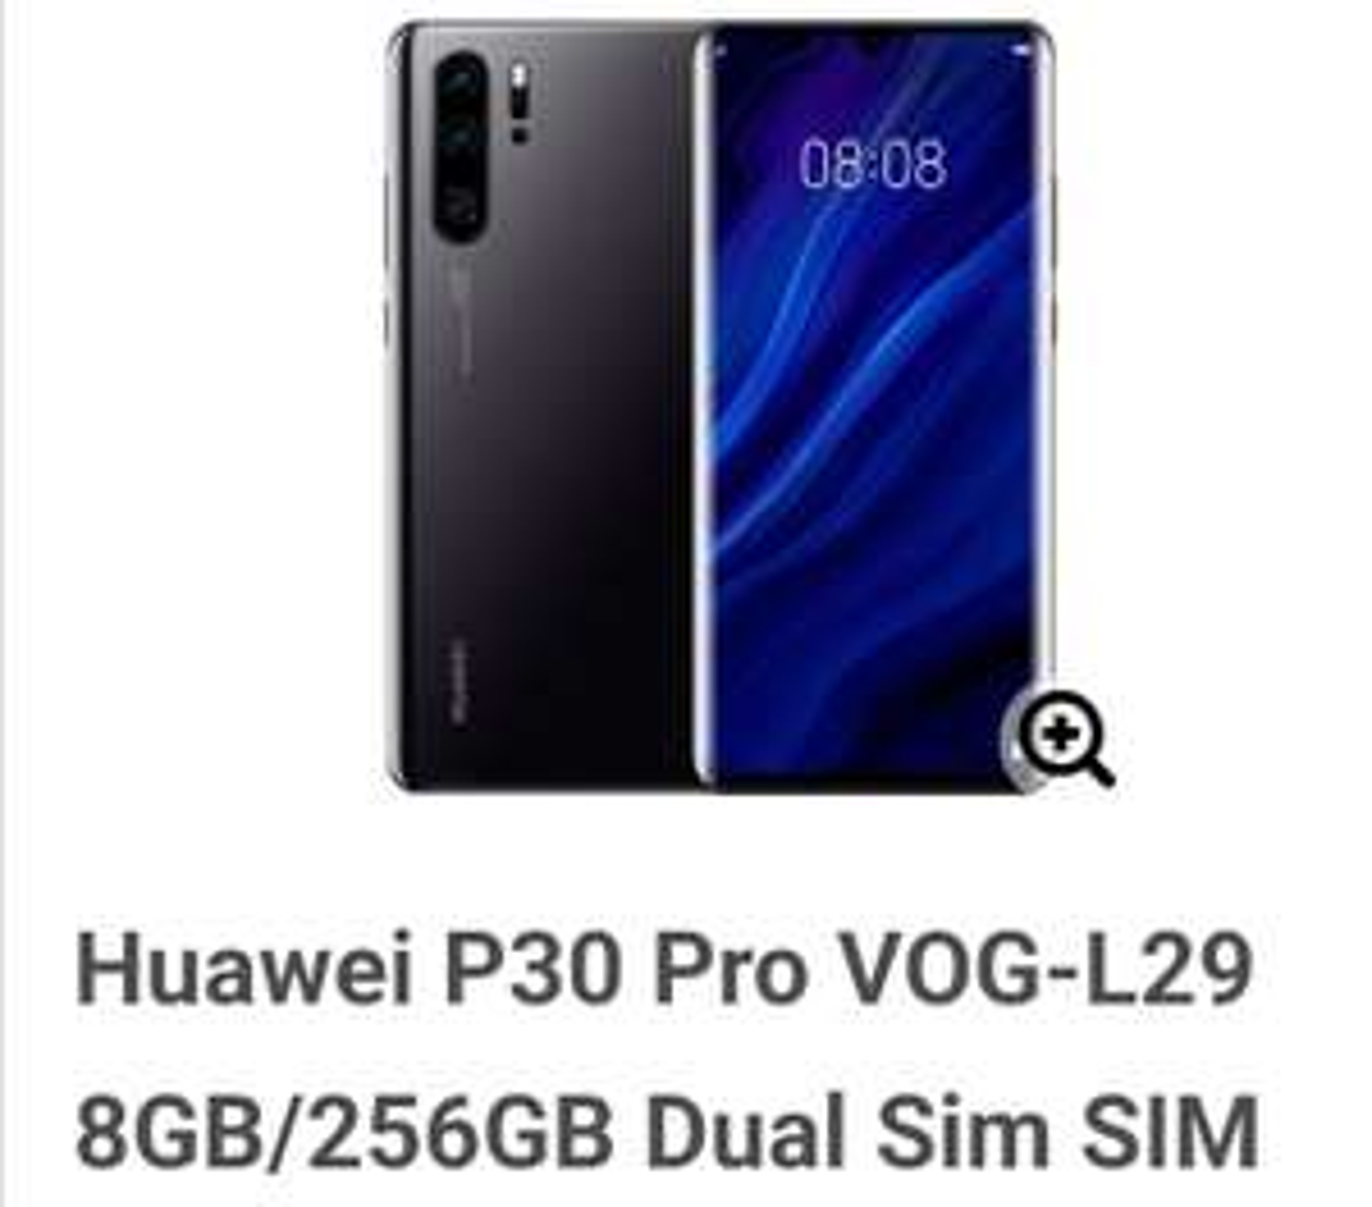 256 GB Huawei P30 Pro. Unlocked , dual SIM. £559.35 @ Eglobal